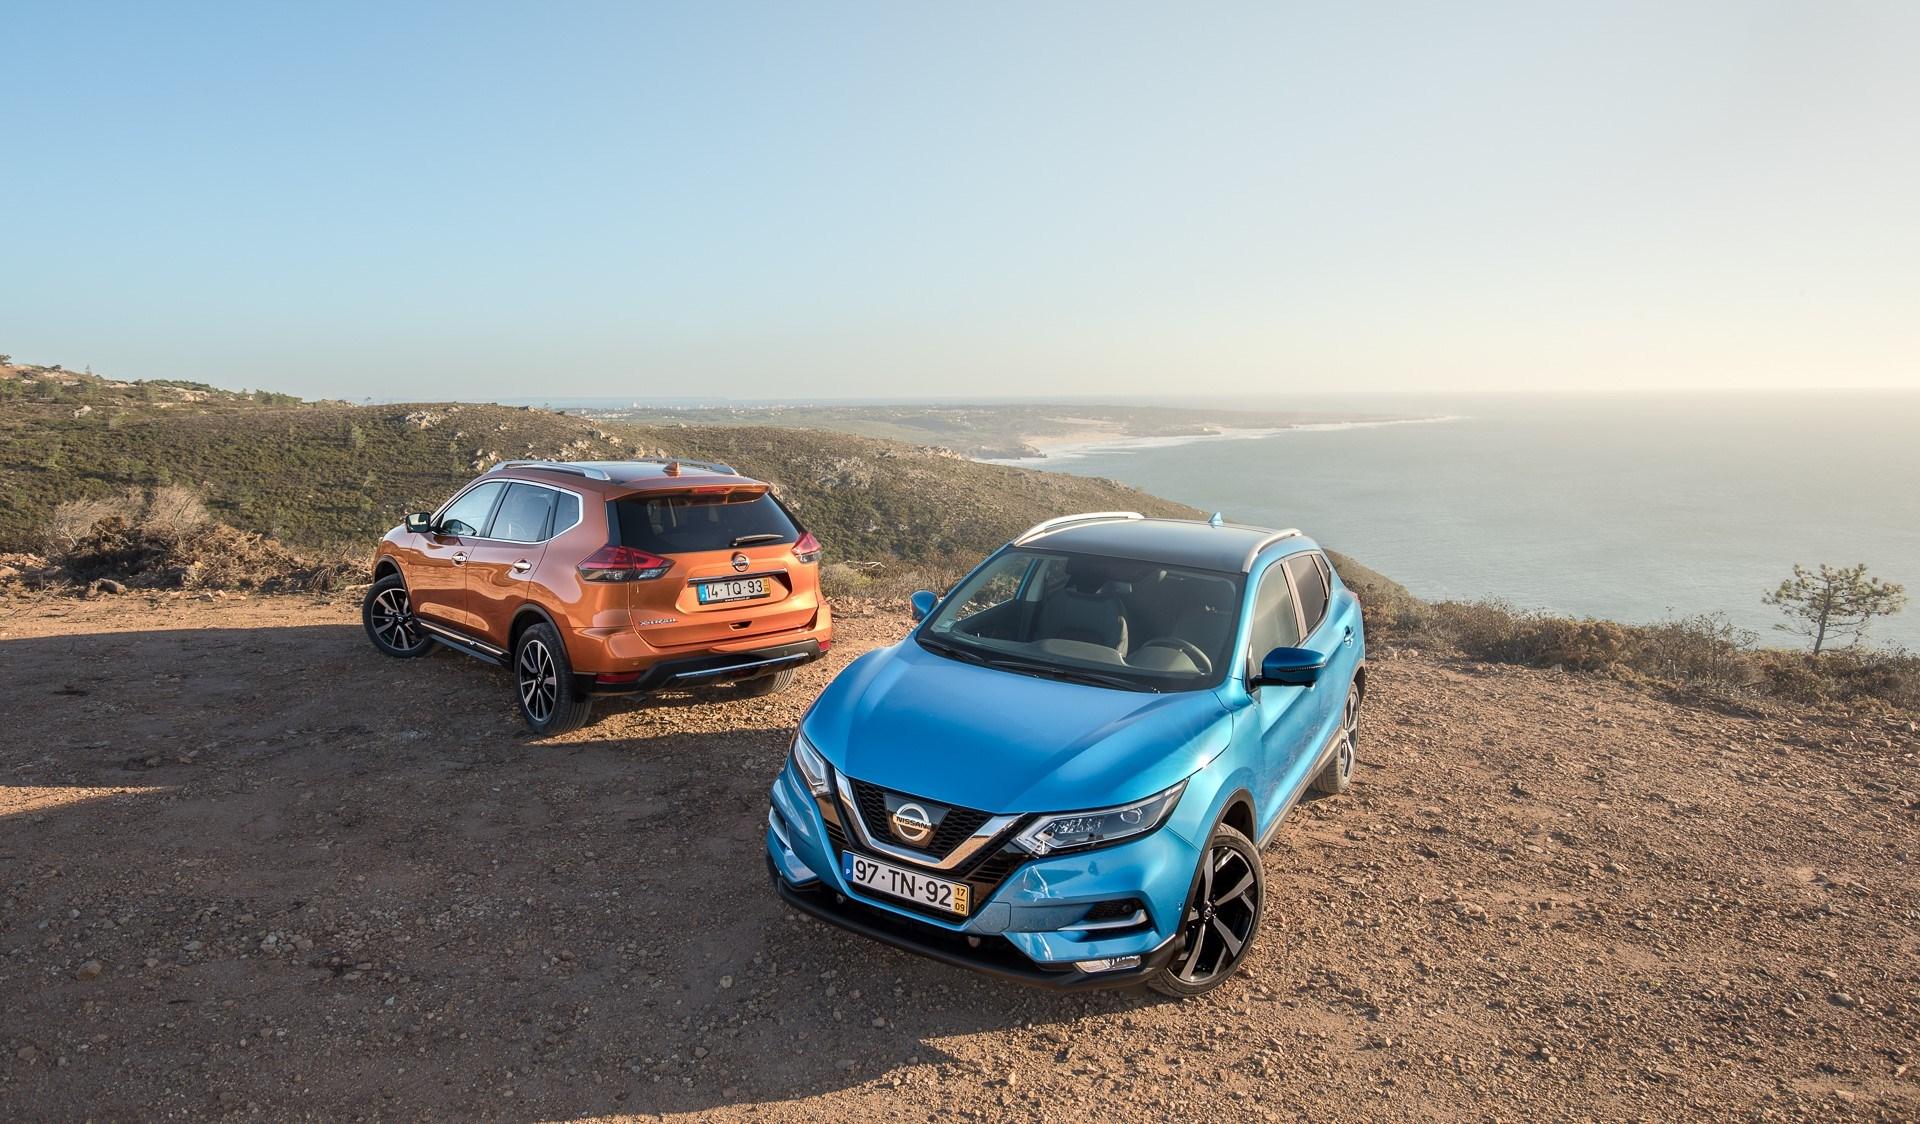 Crossover Domination: Novos Nissan Qashqai e X-Trail